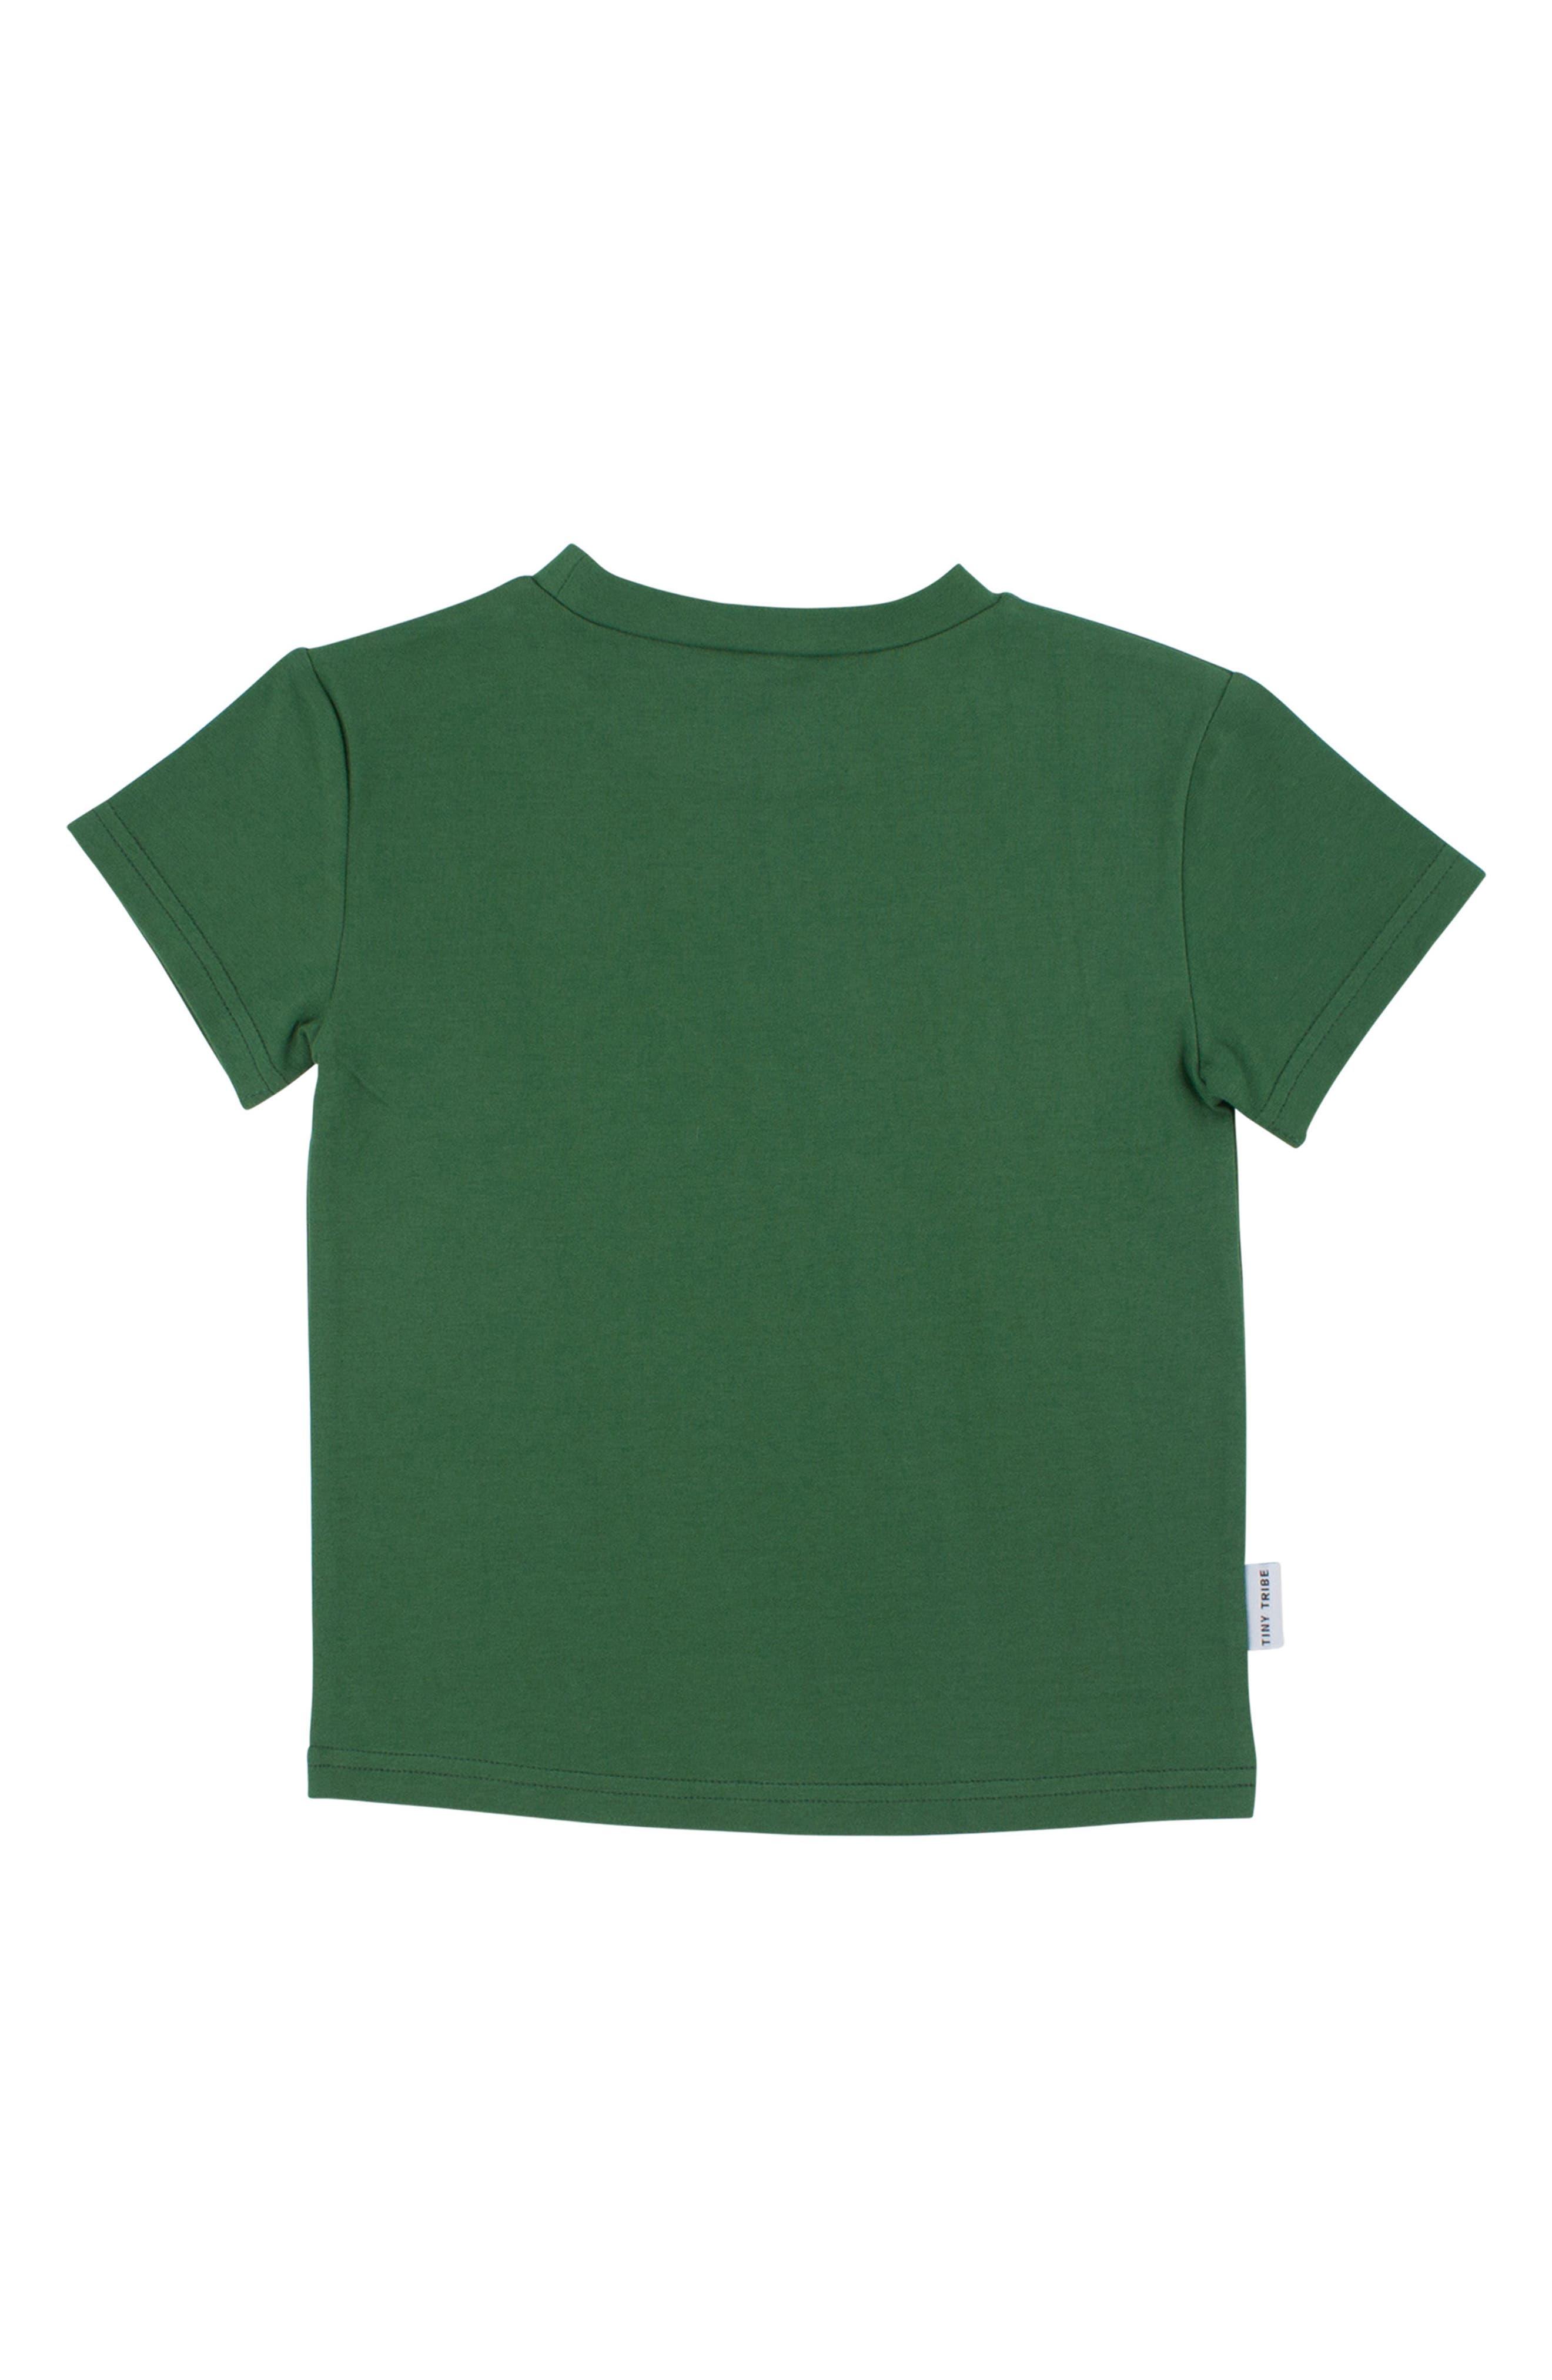 I Love Kale Graphic T-Shirt,                             Alternate thumbnail 2, color,                             Green